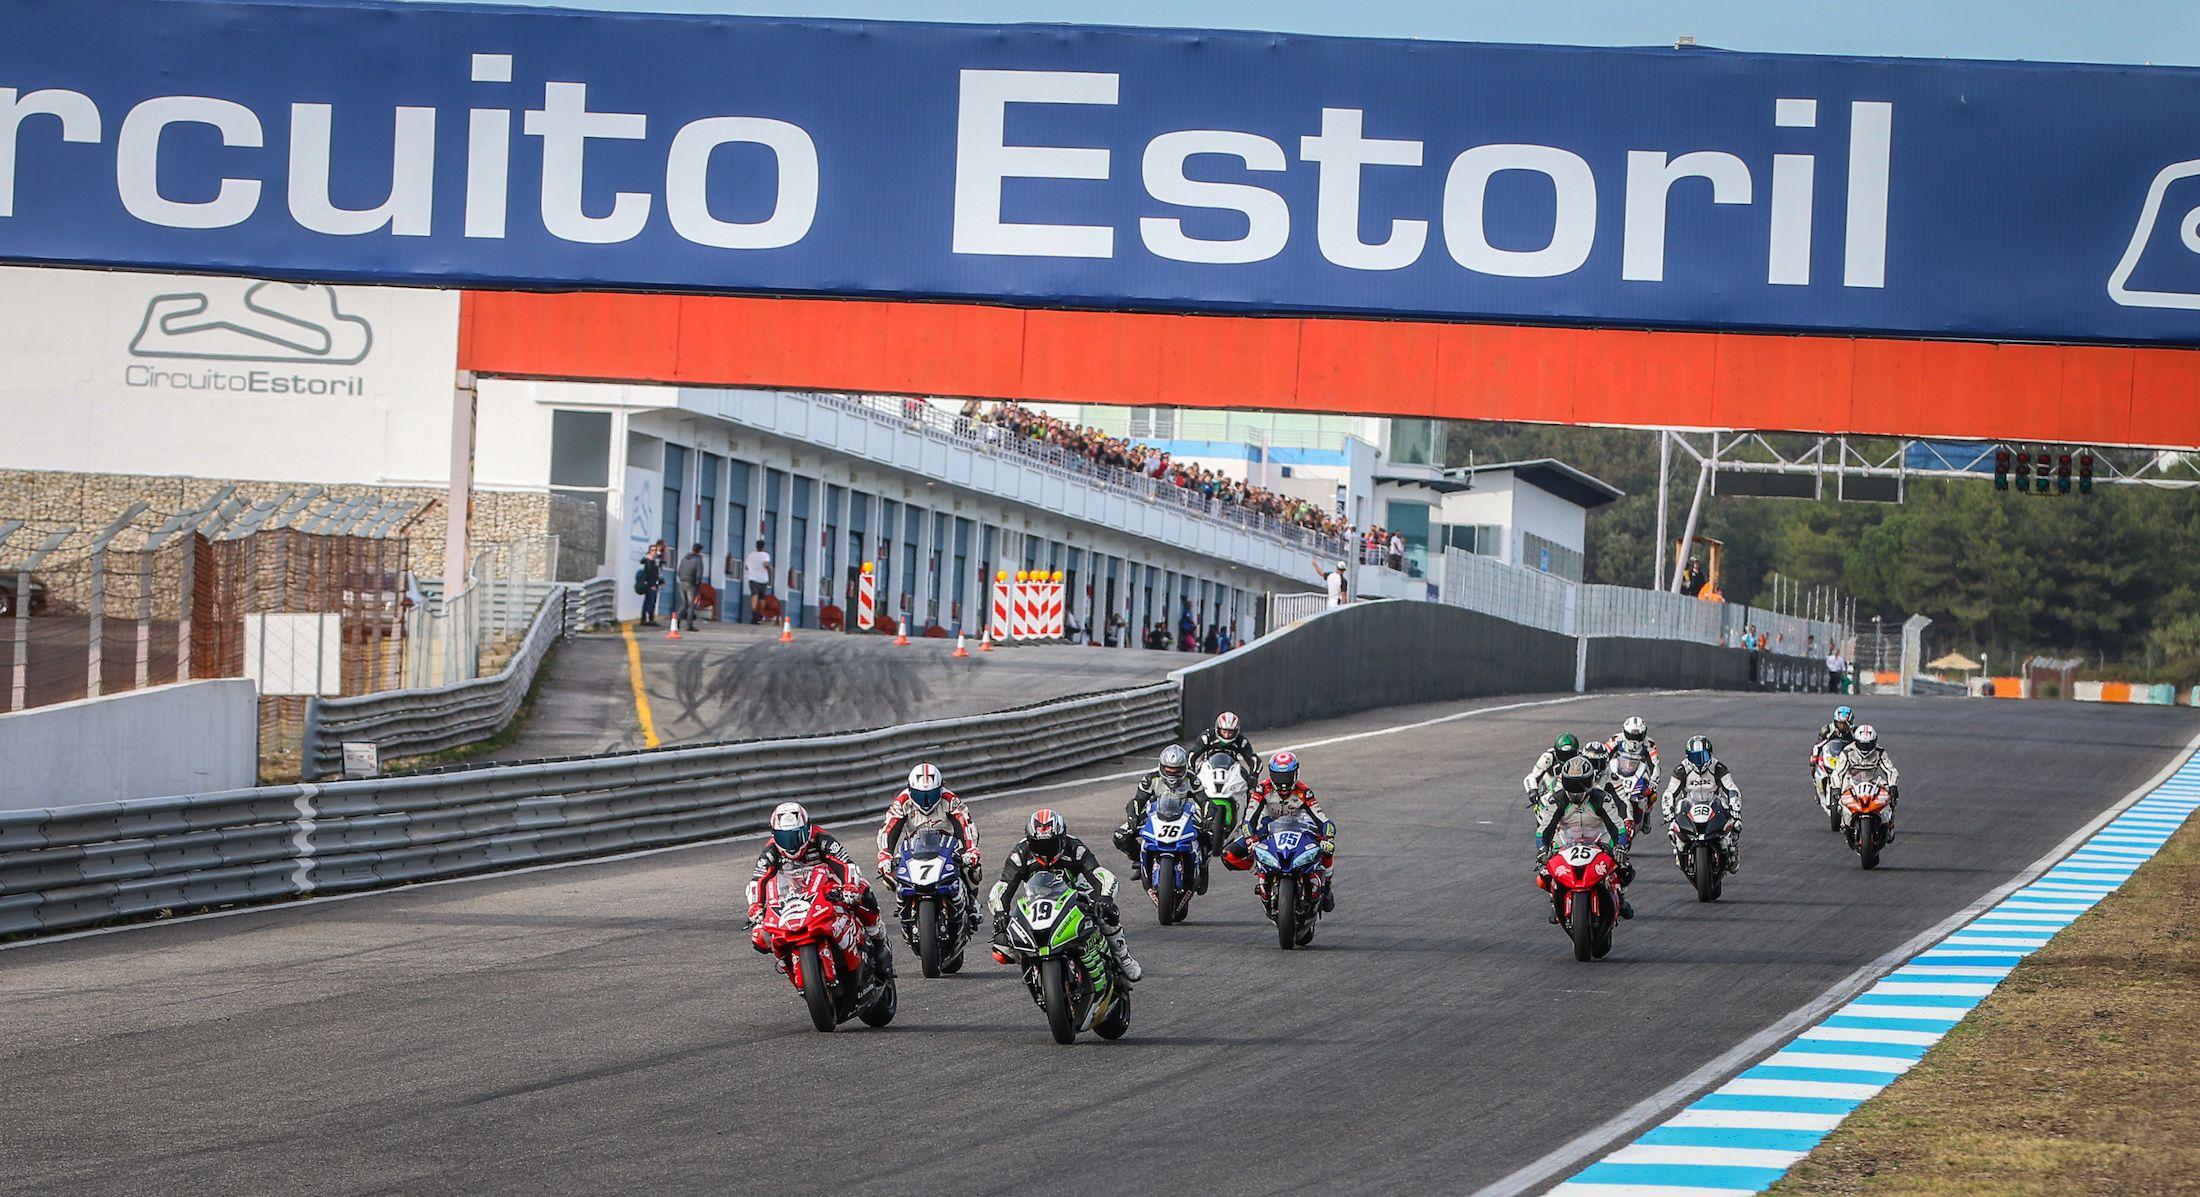 3 Horas Estoril Resistência abre temporadahttp://www.motorcyclesports.pt/3-horas-estoril-resistencia-abre-temporada/